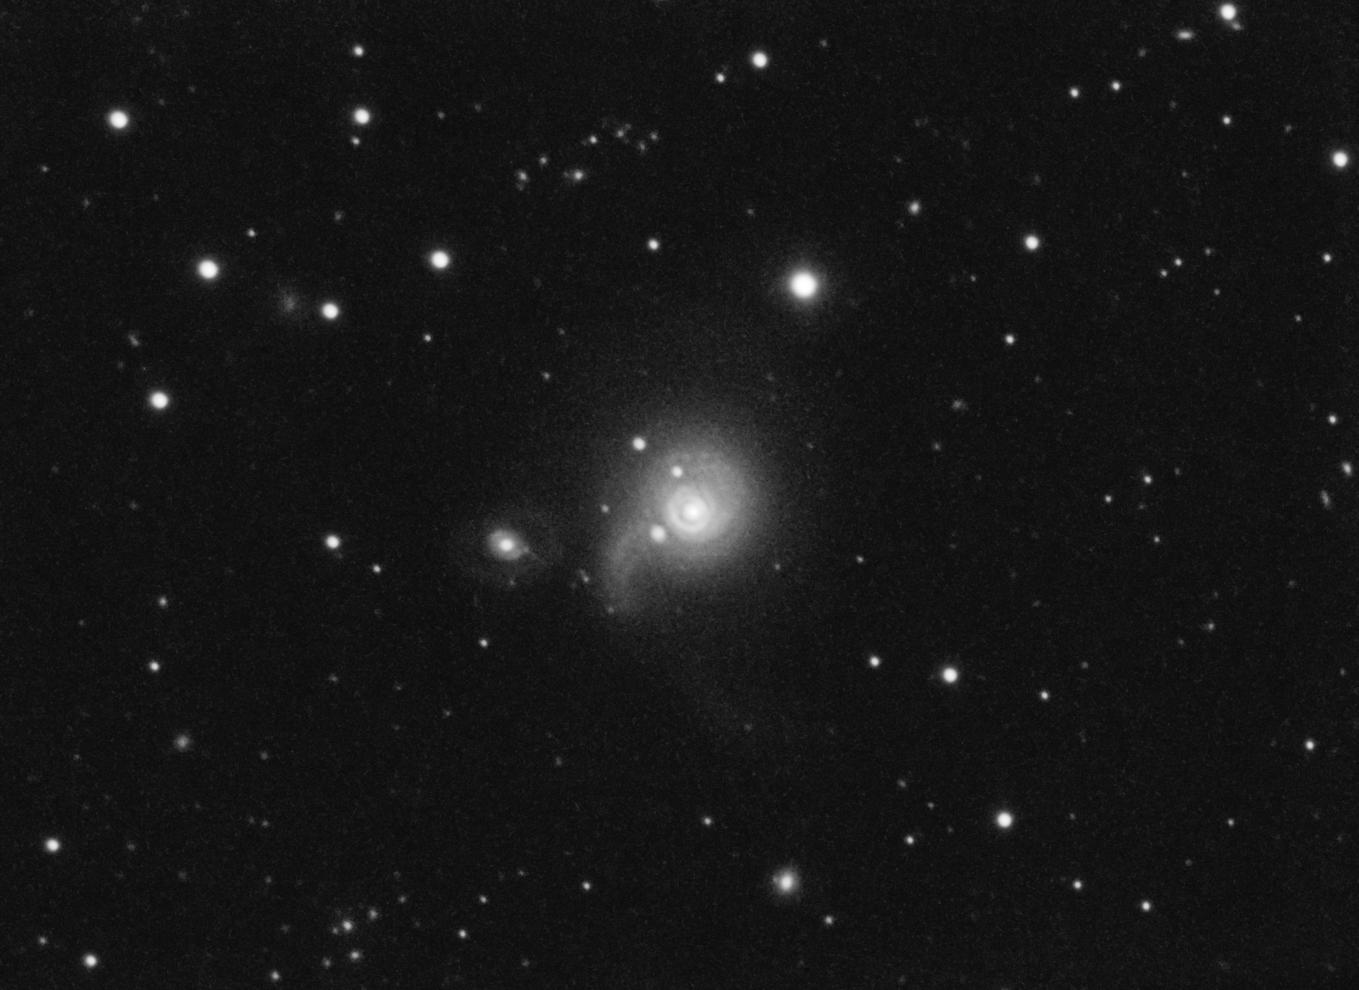 2014_04_25_HD800_ATIK314E_NGC5614_L_b1x1_11x600s_12x900s_crop_dbe_deconv_hist_hdr_lhe_nr